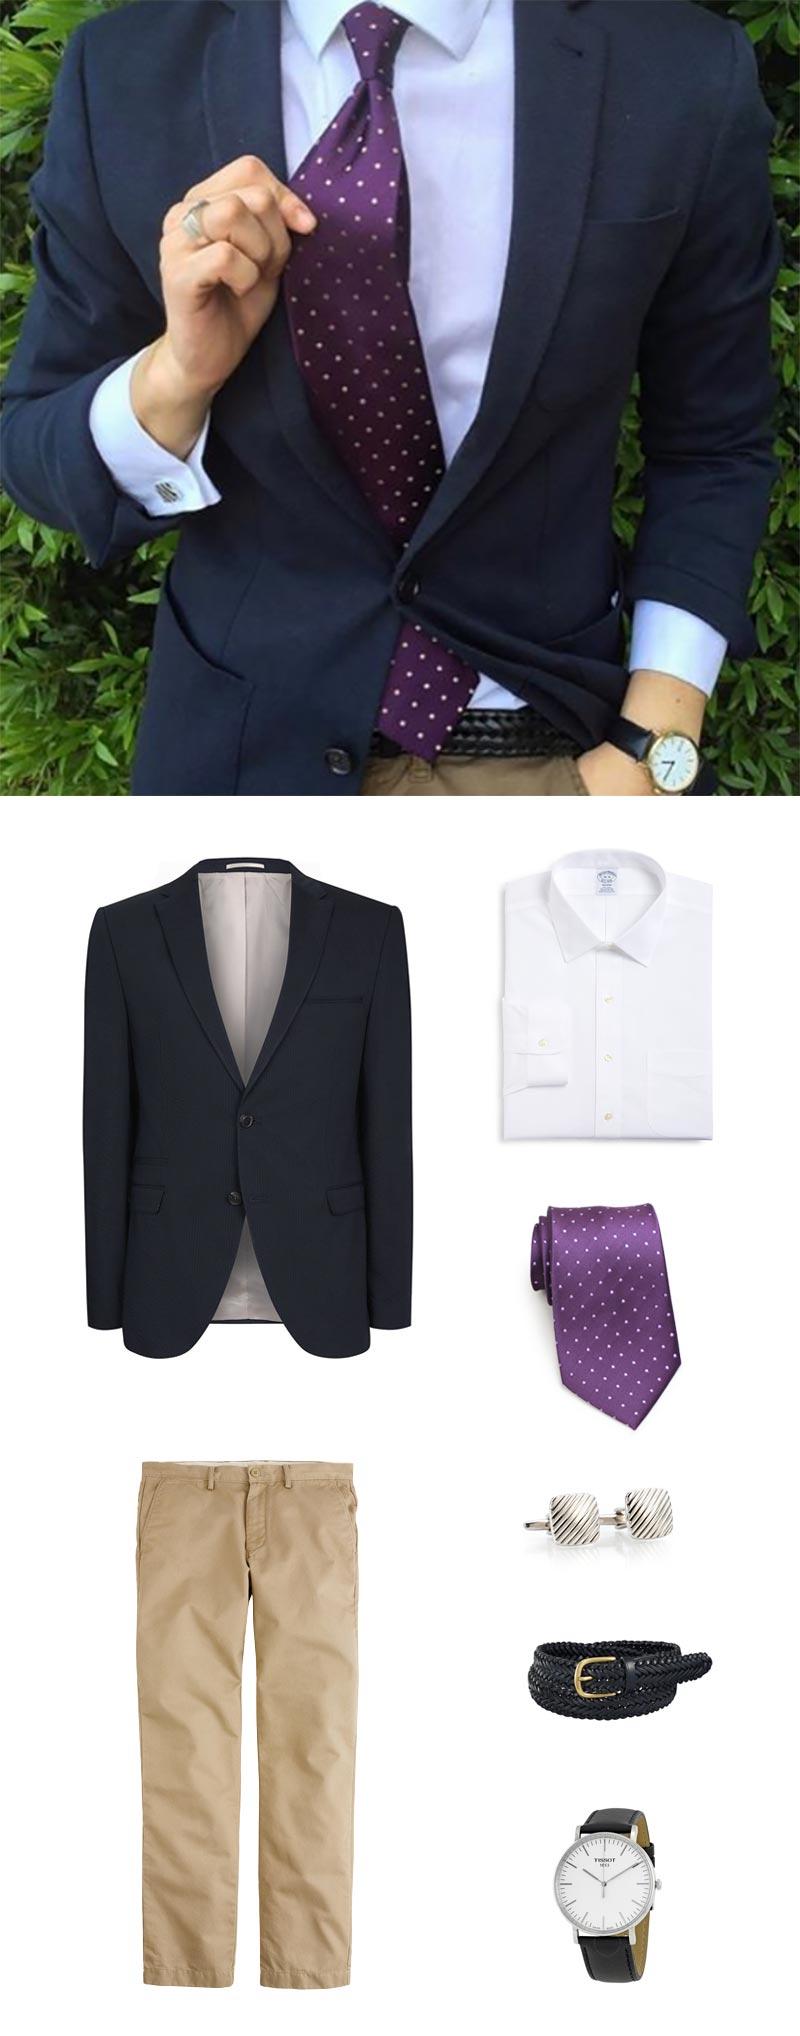 Menswear Classics - Navy Jacket + Small Dot Purple Necktie